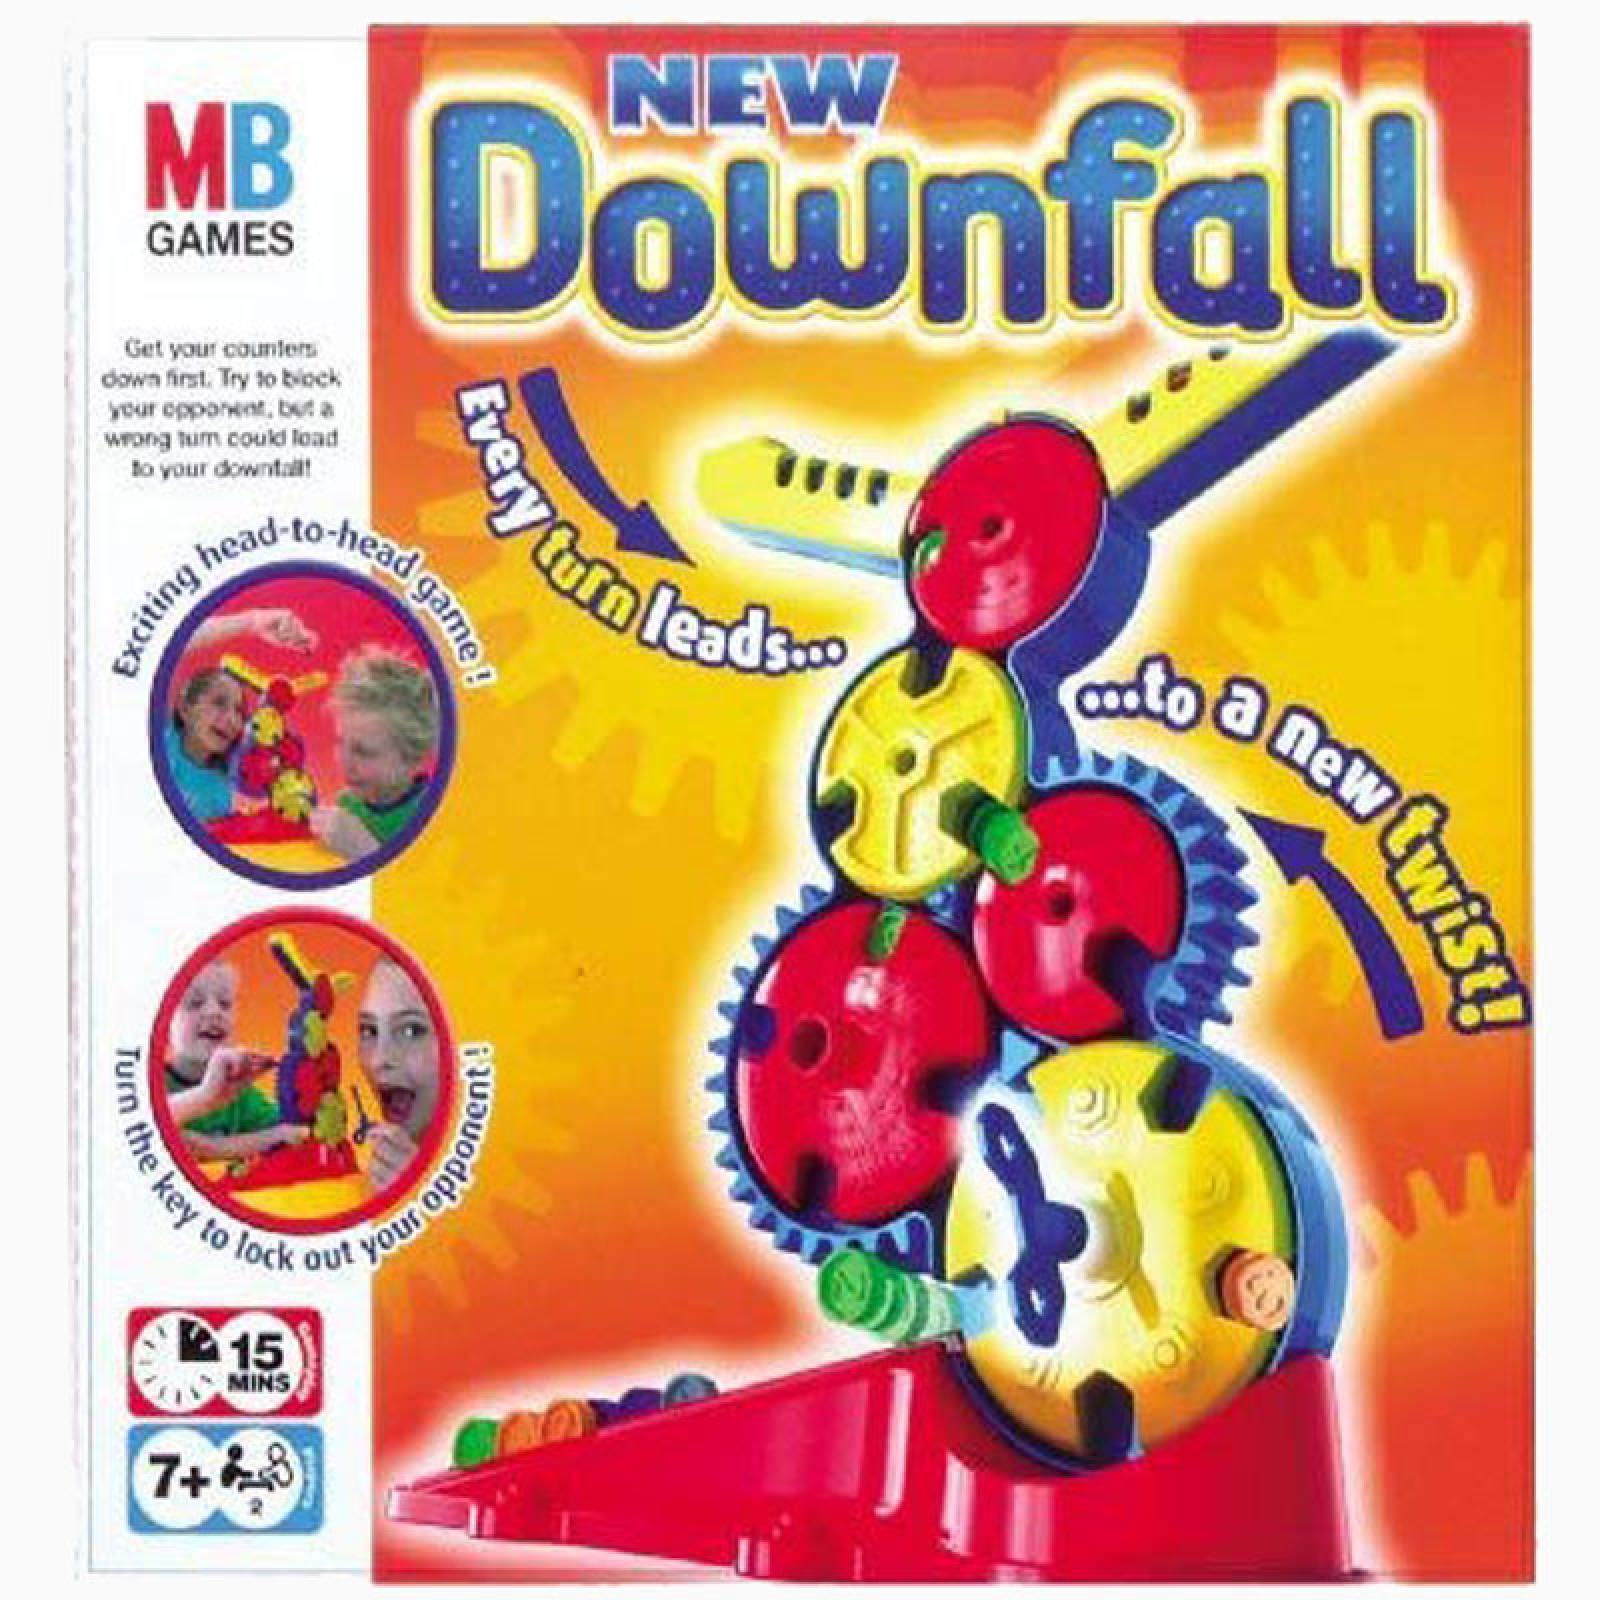 Downfall Game 7+